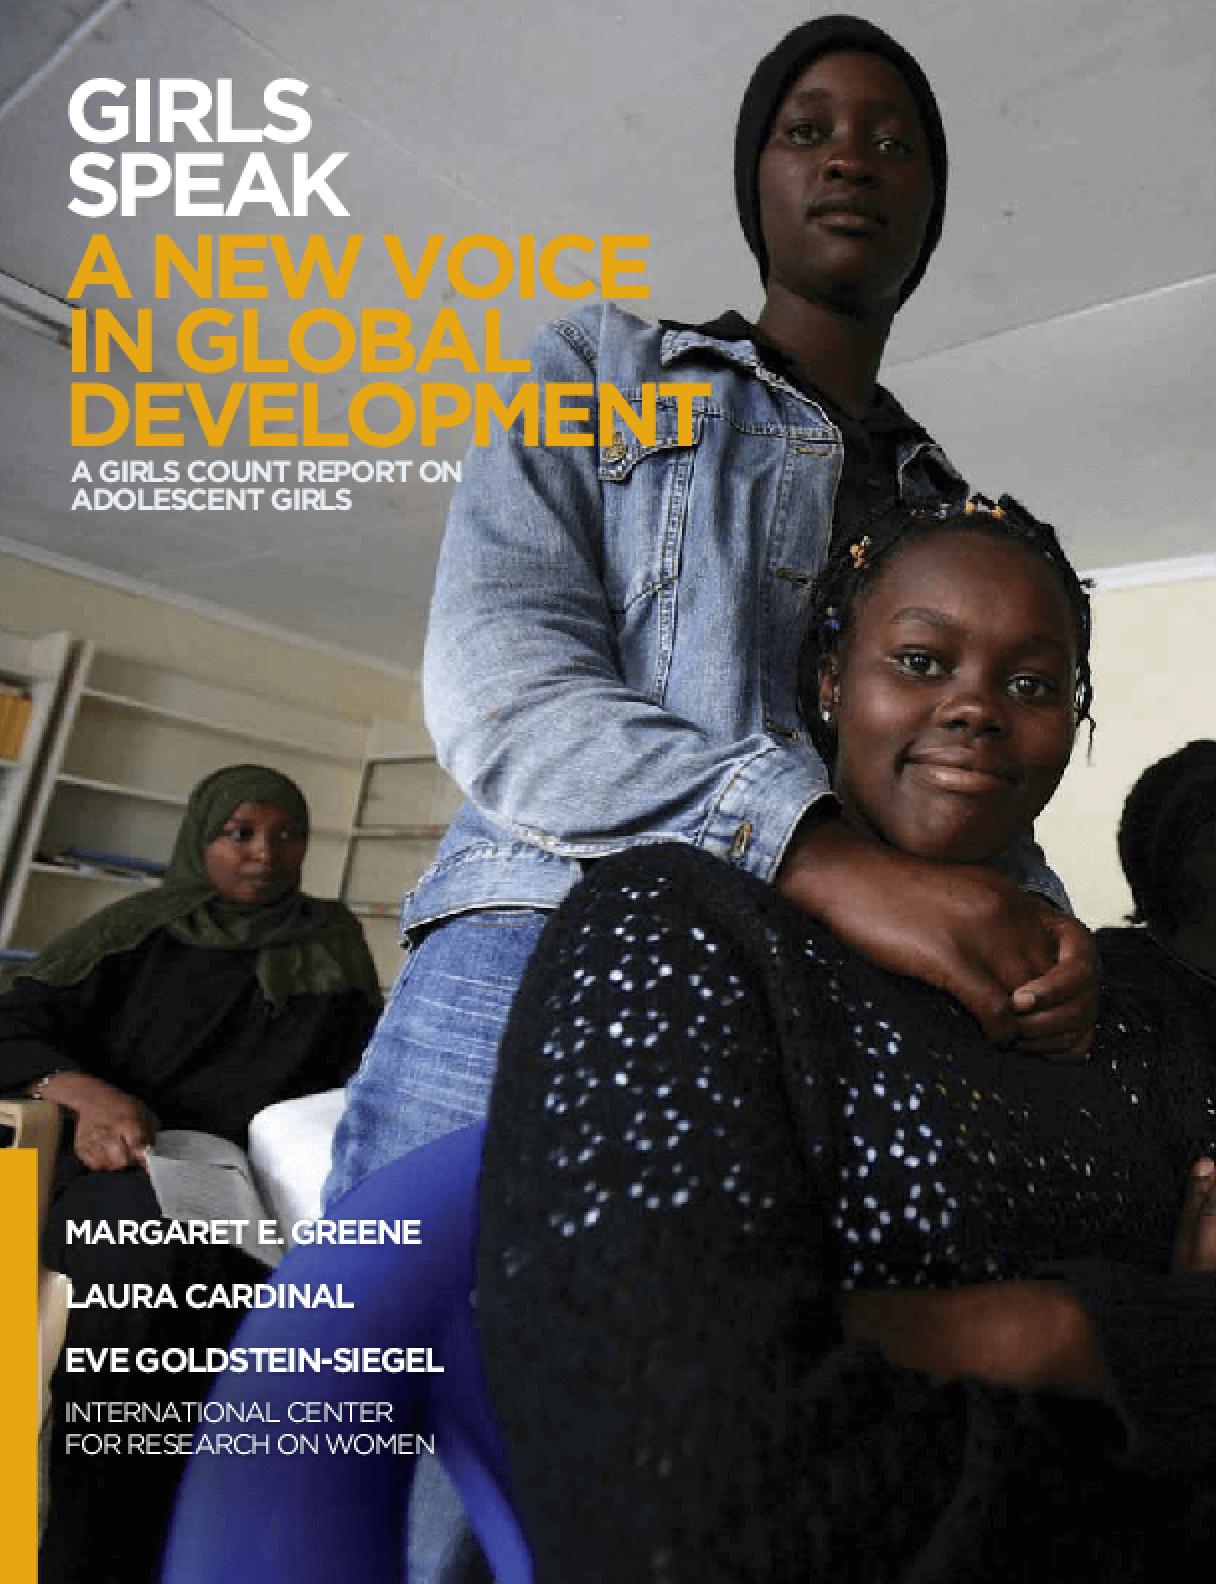 Girls Speak: A New Voice in Global Development